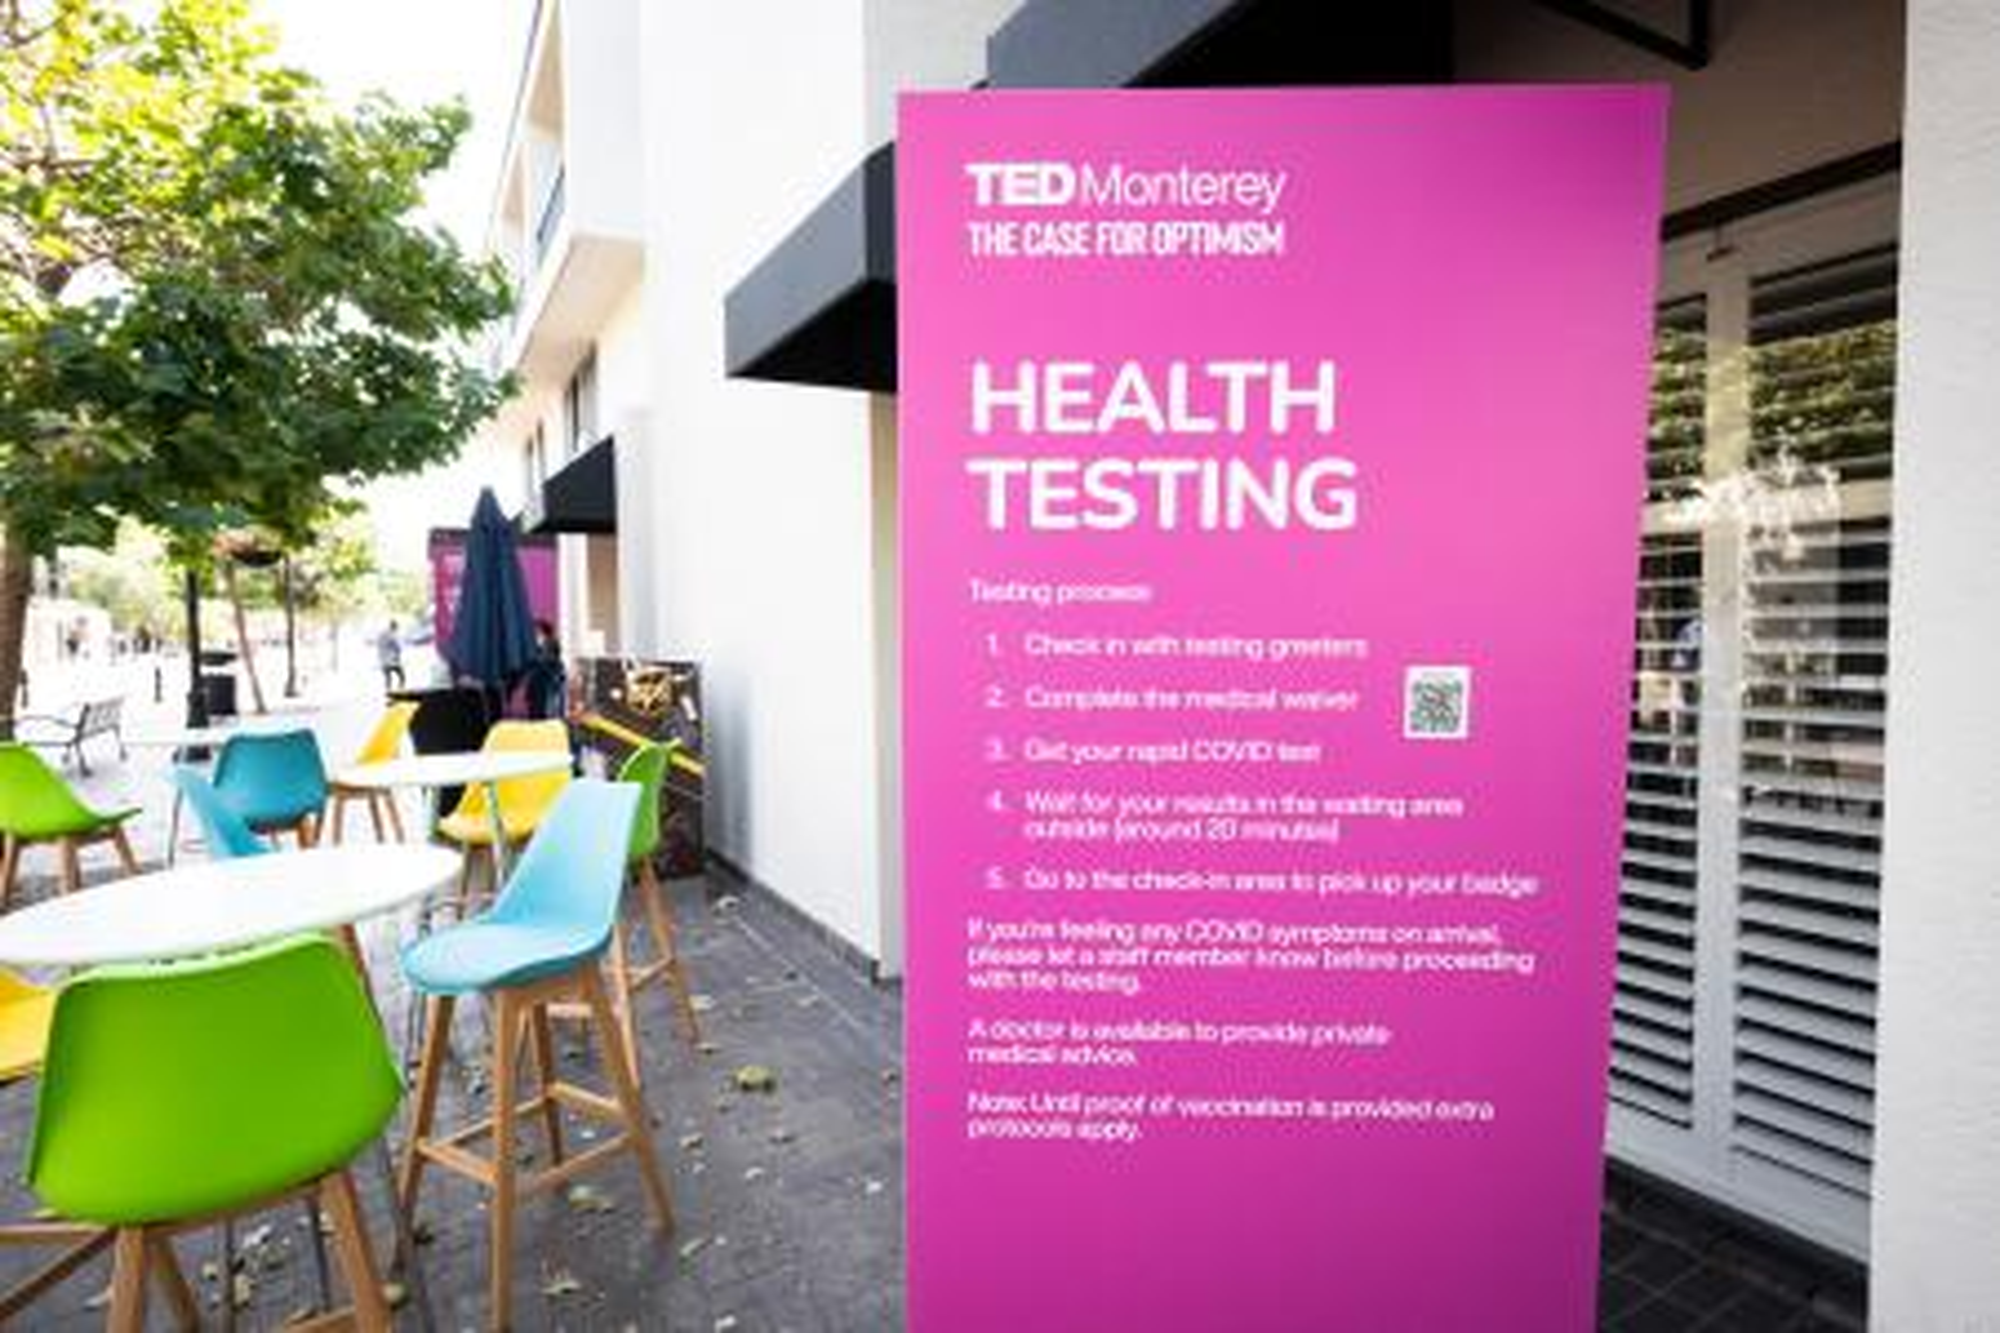 The health testing area